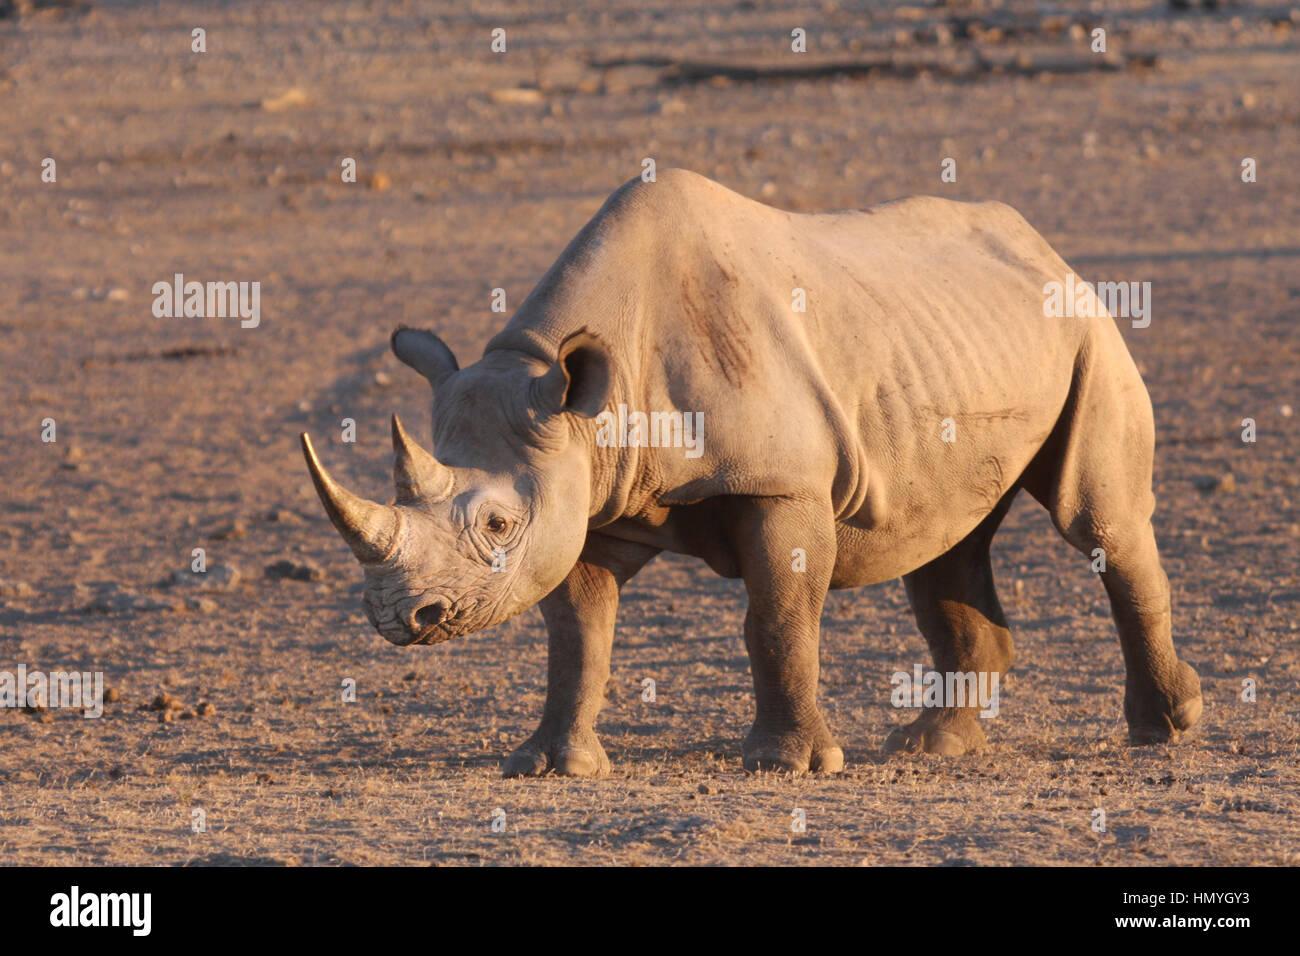 Rhino walking to a water hole - Stock Image